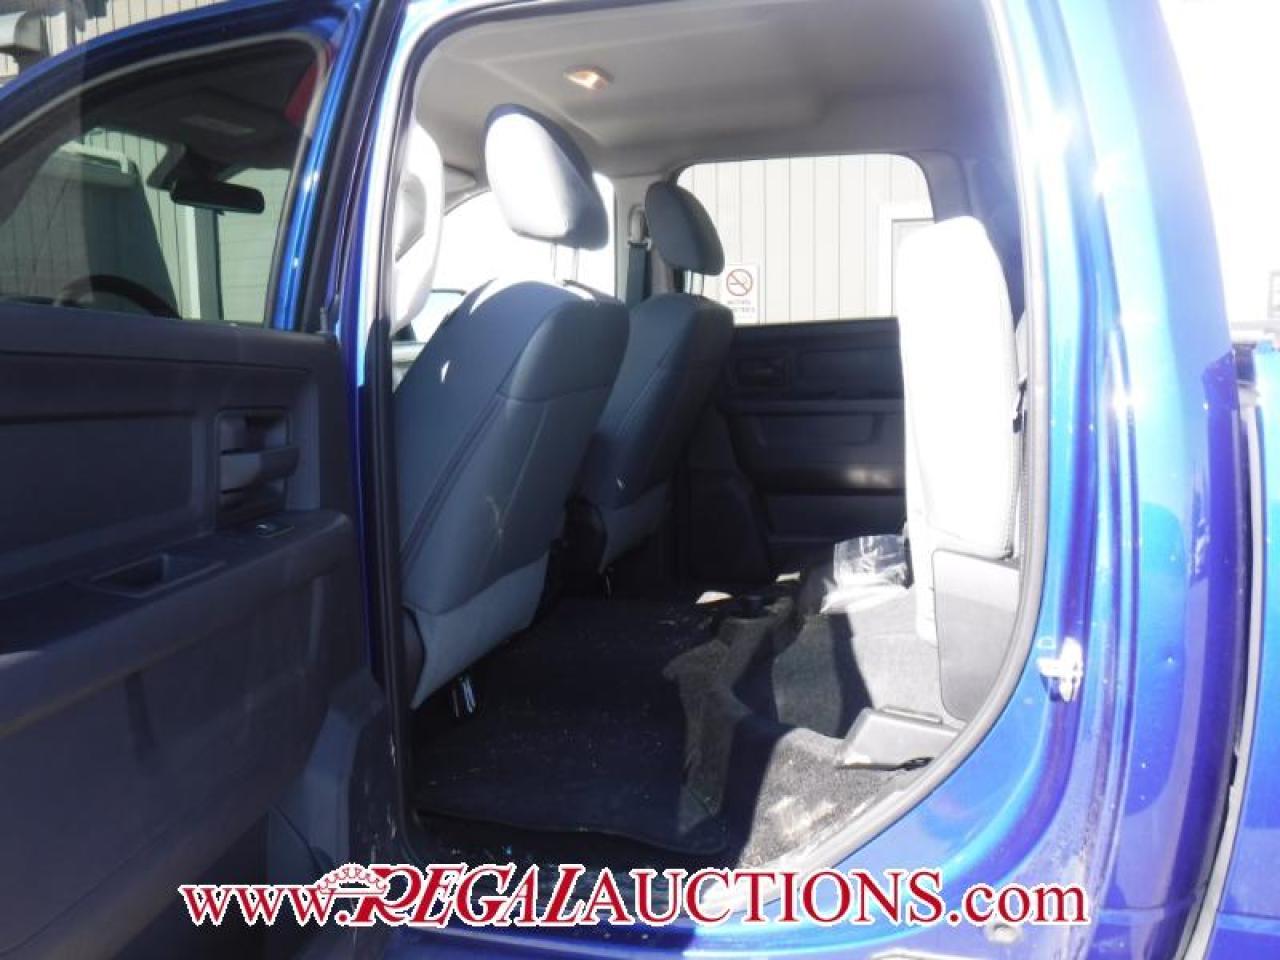 2016 Dodge RAM 1500 SXT CREW CAB 4WD